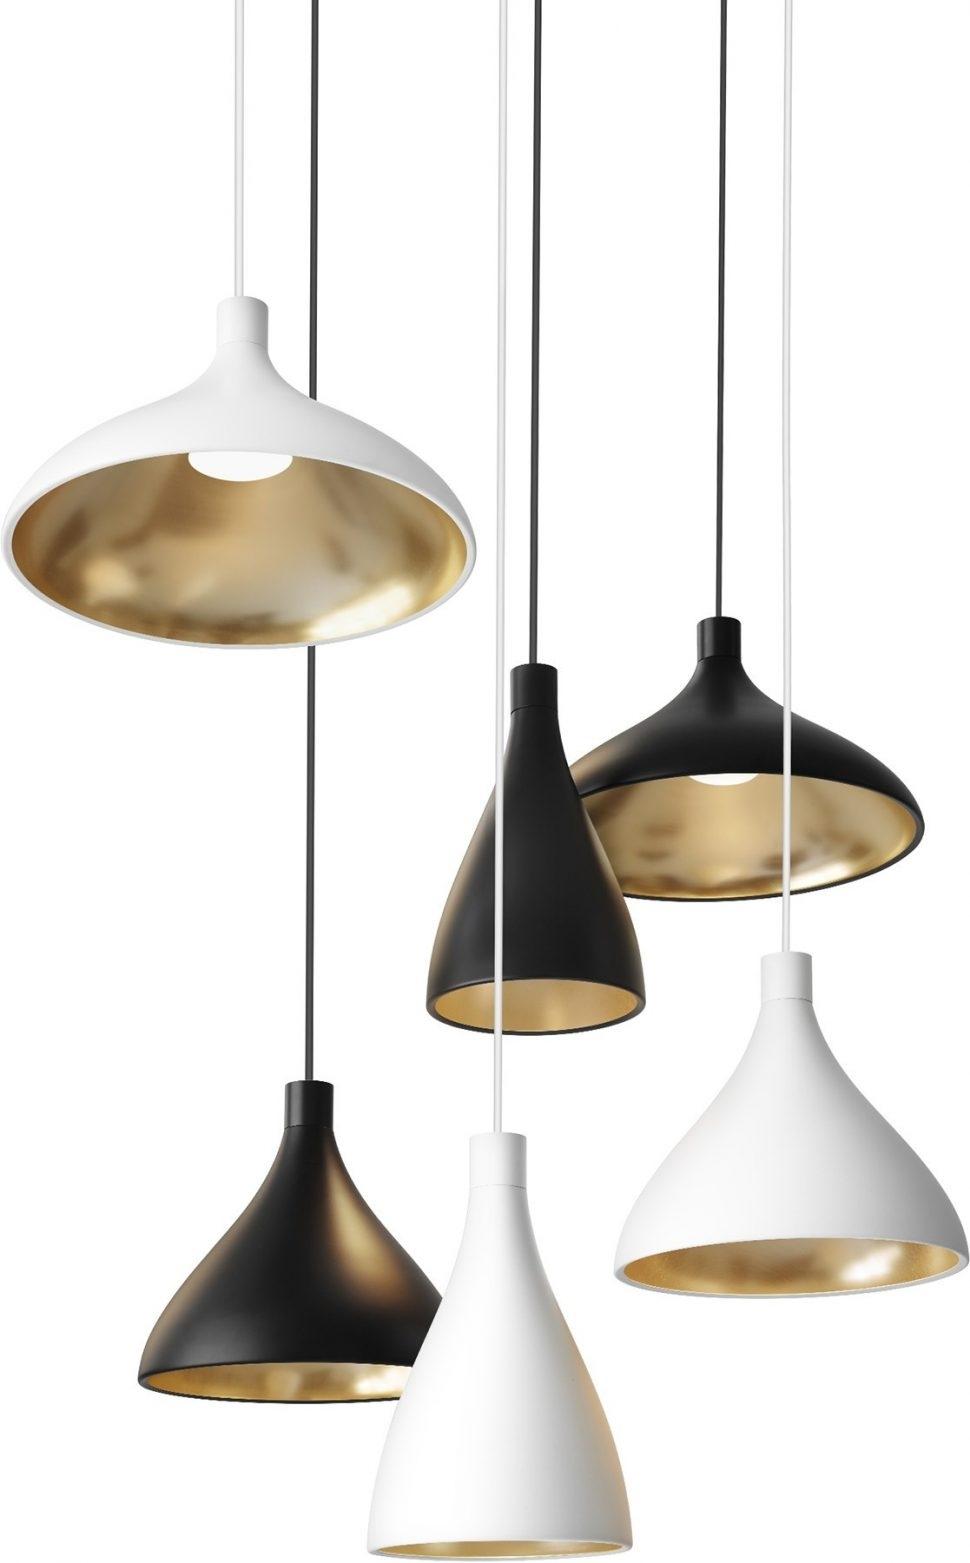 Hanging Bar Lights Kitchen Pendant Lighting Fixtures Modern Glass Intended For Modern Pendant Lighting Fixtures (#6 of 15)